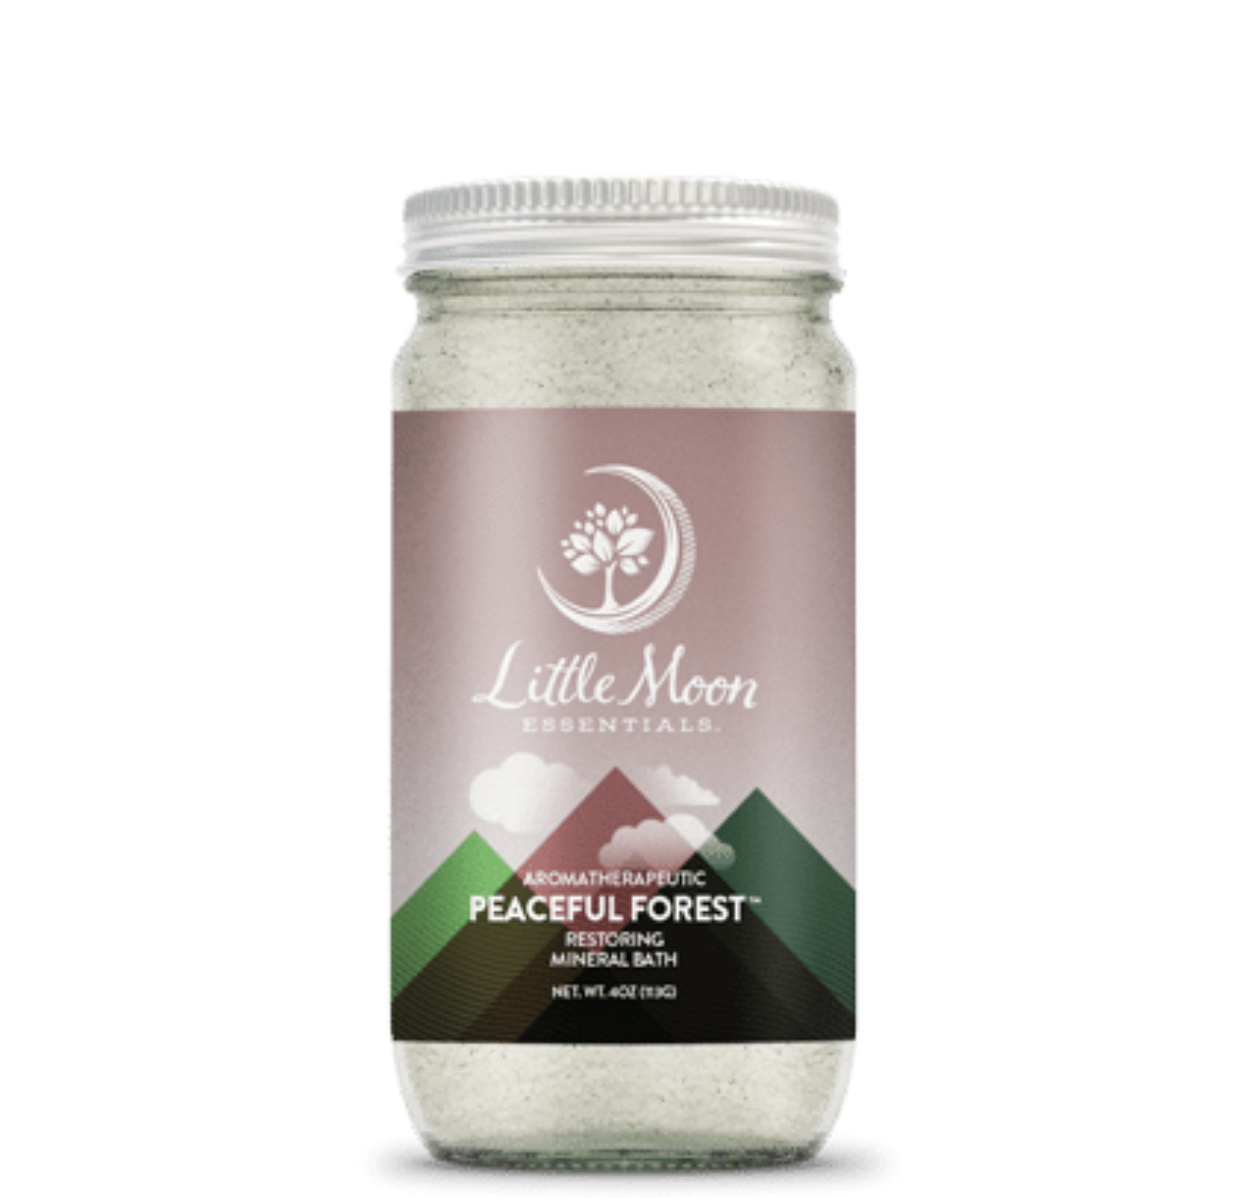 Little Moon Essentials Bath Salt 4oz - Peaceful Forest